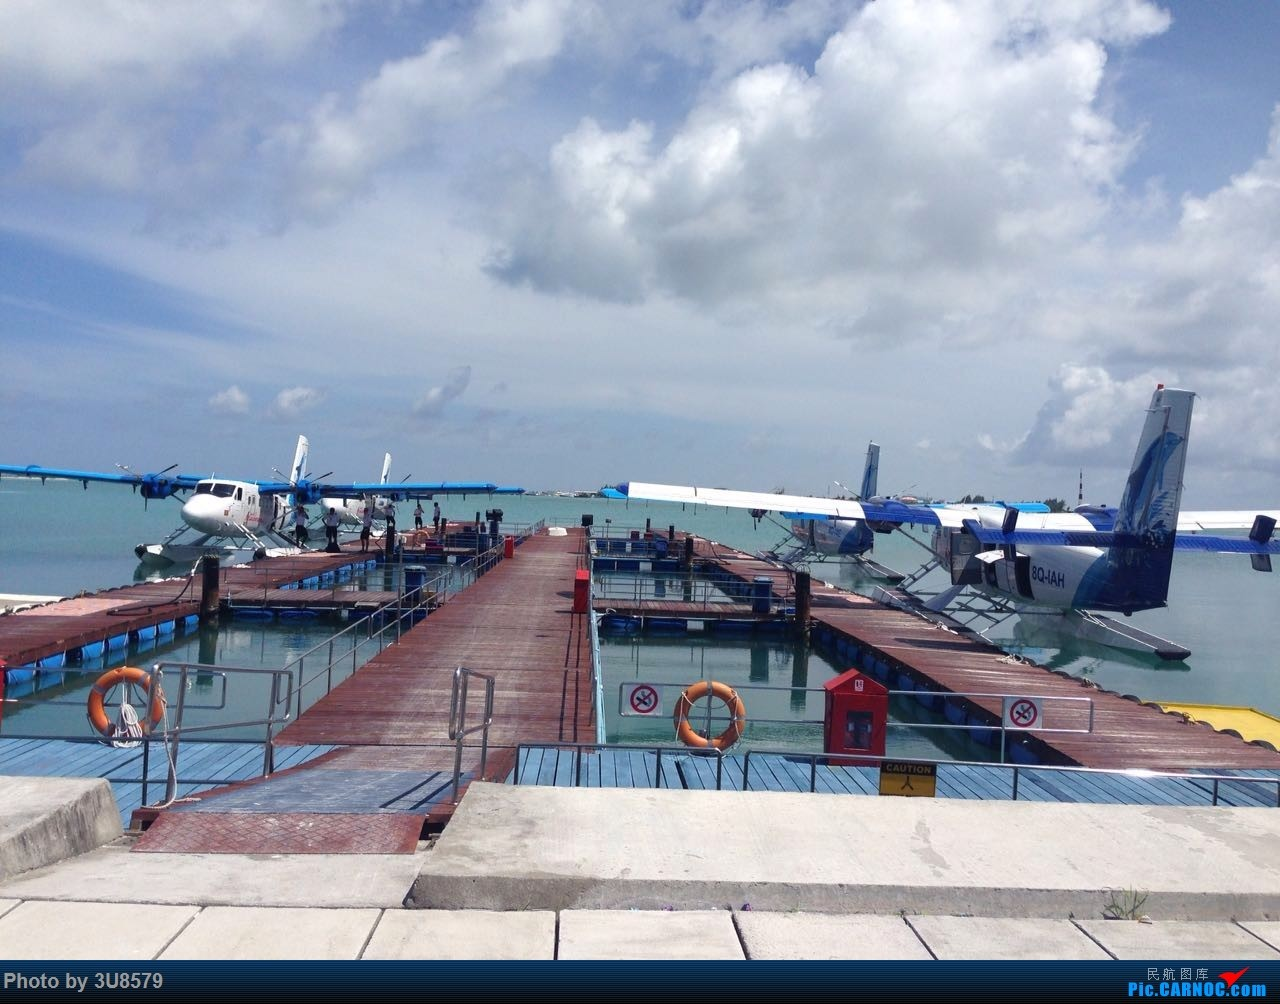 Re:马尔代夫水上飞机    马尔代夫马累机场